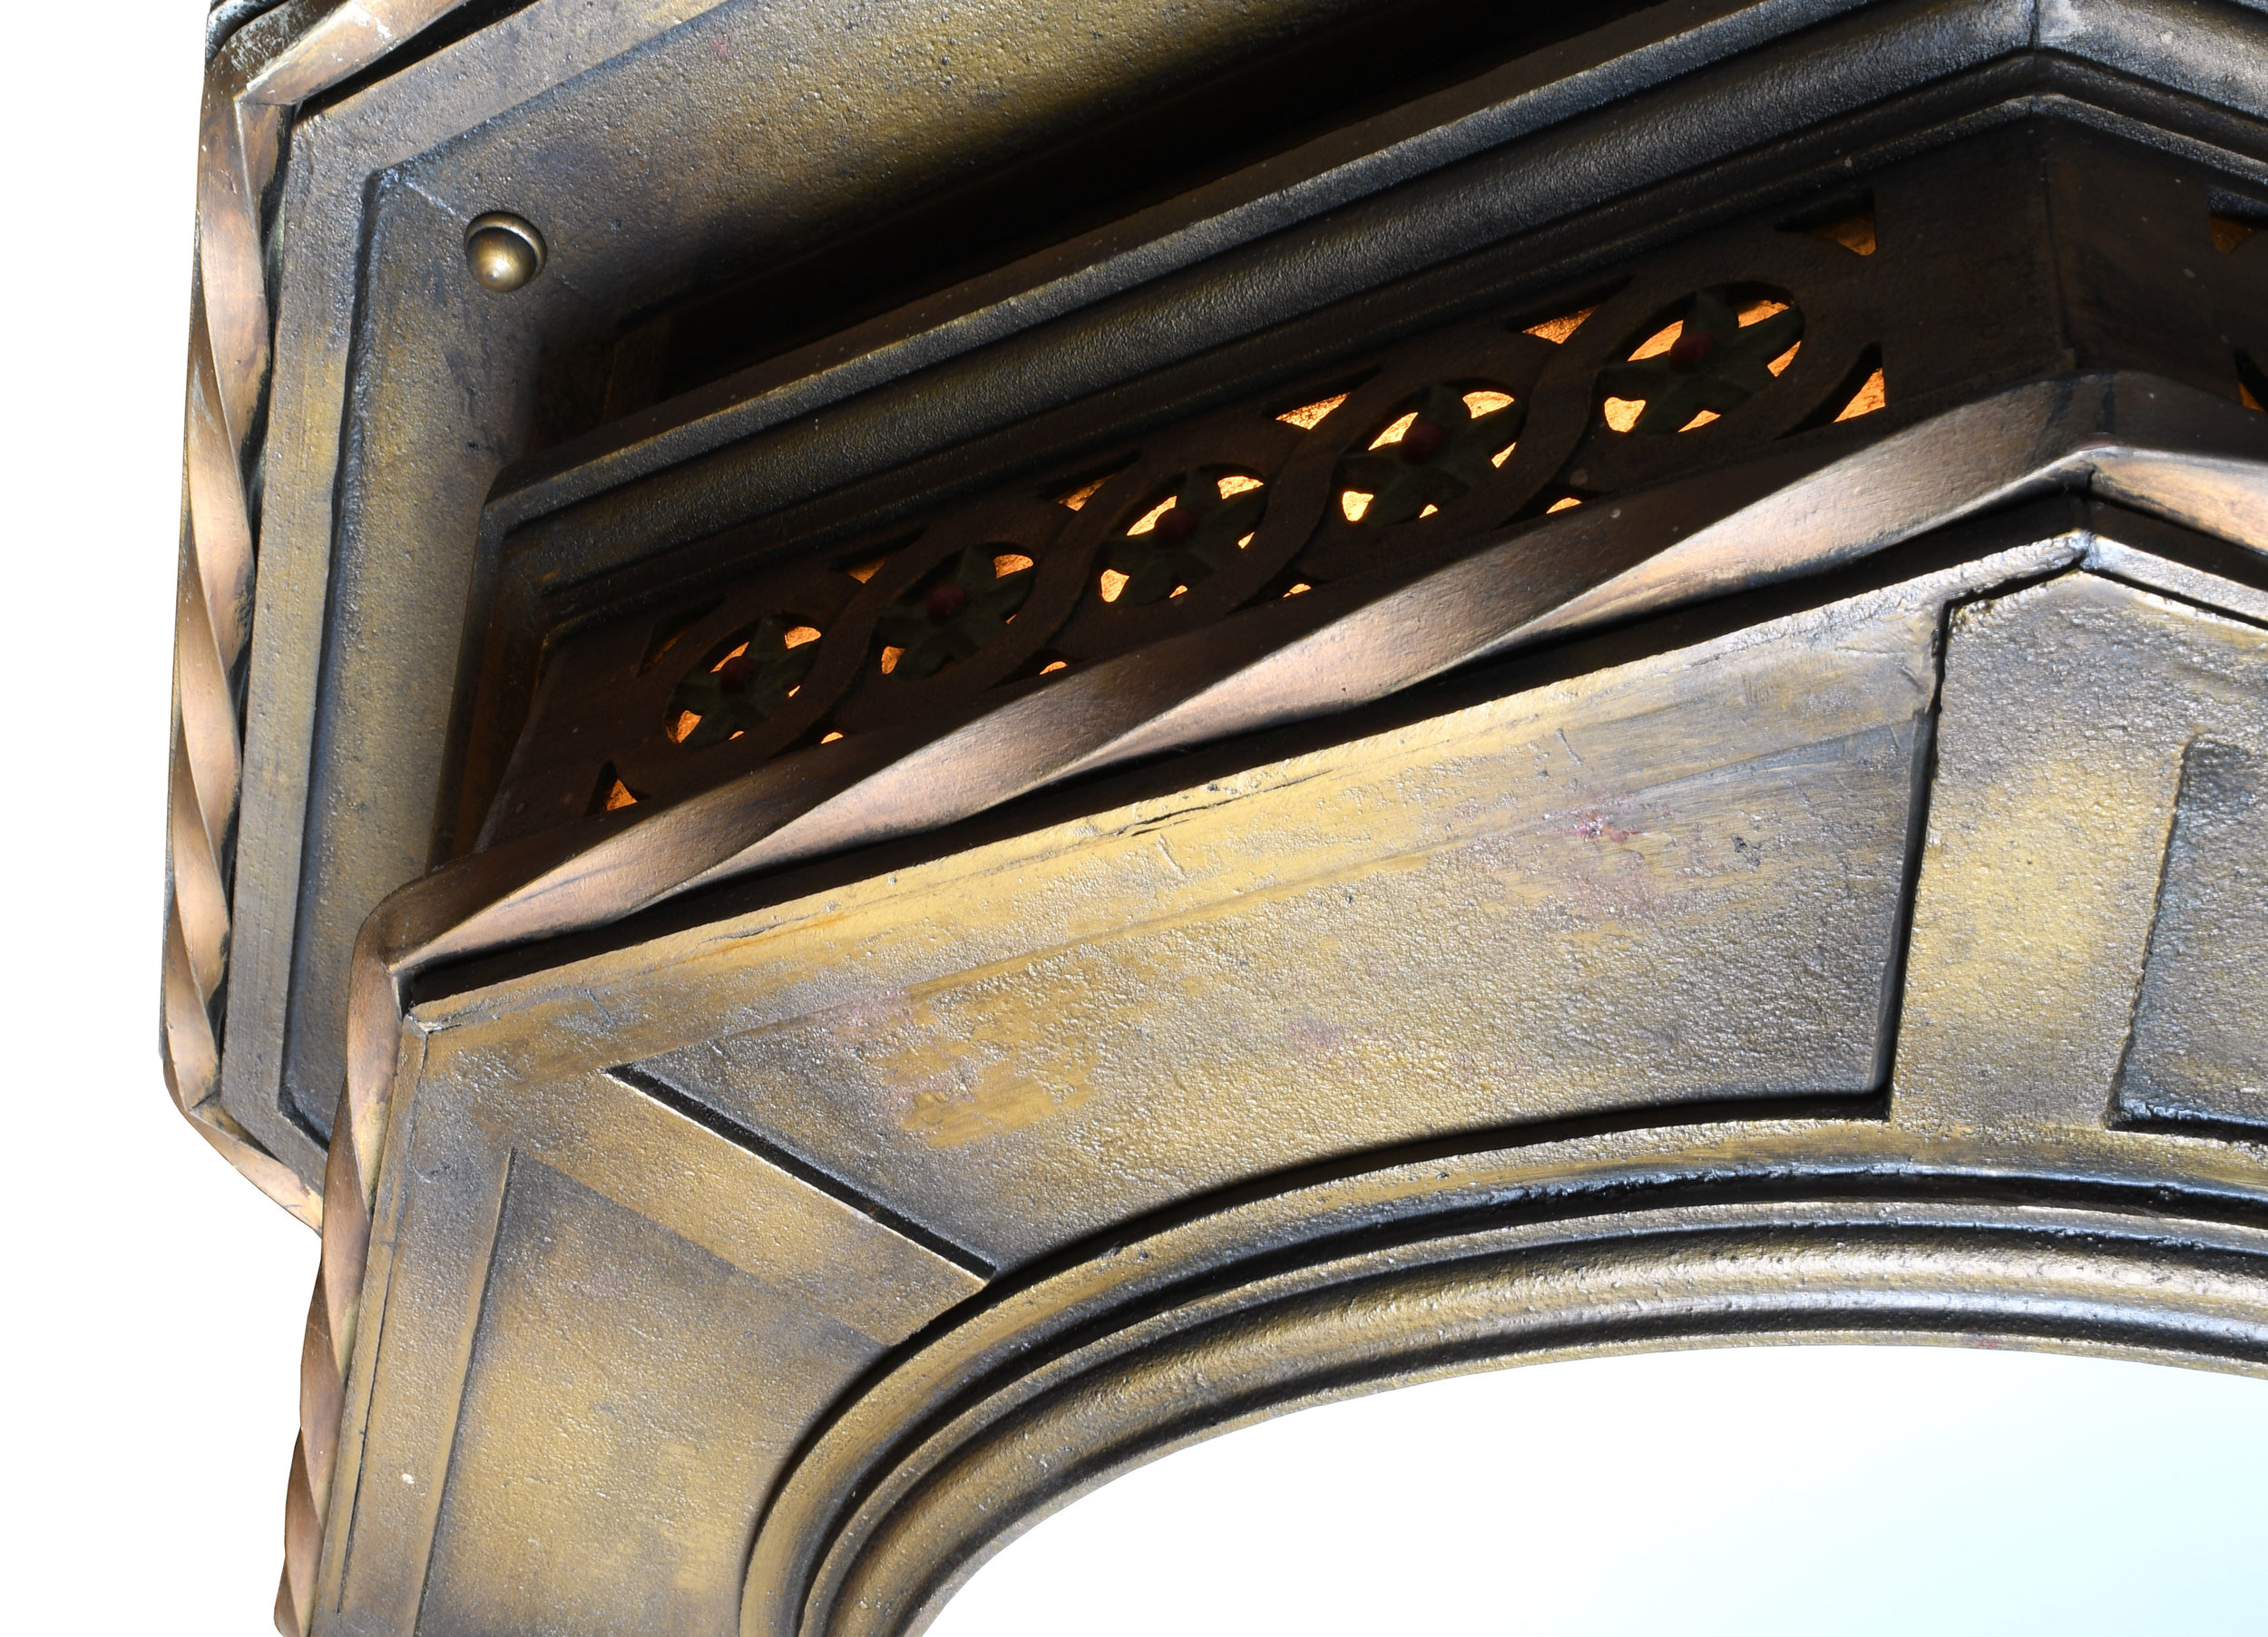 47785-octagonal-16-light-theater-flush-mount-lit-up-interior-detail.jpg